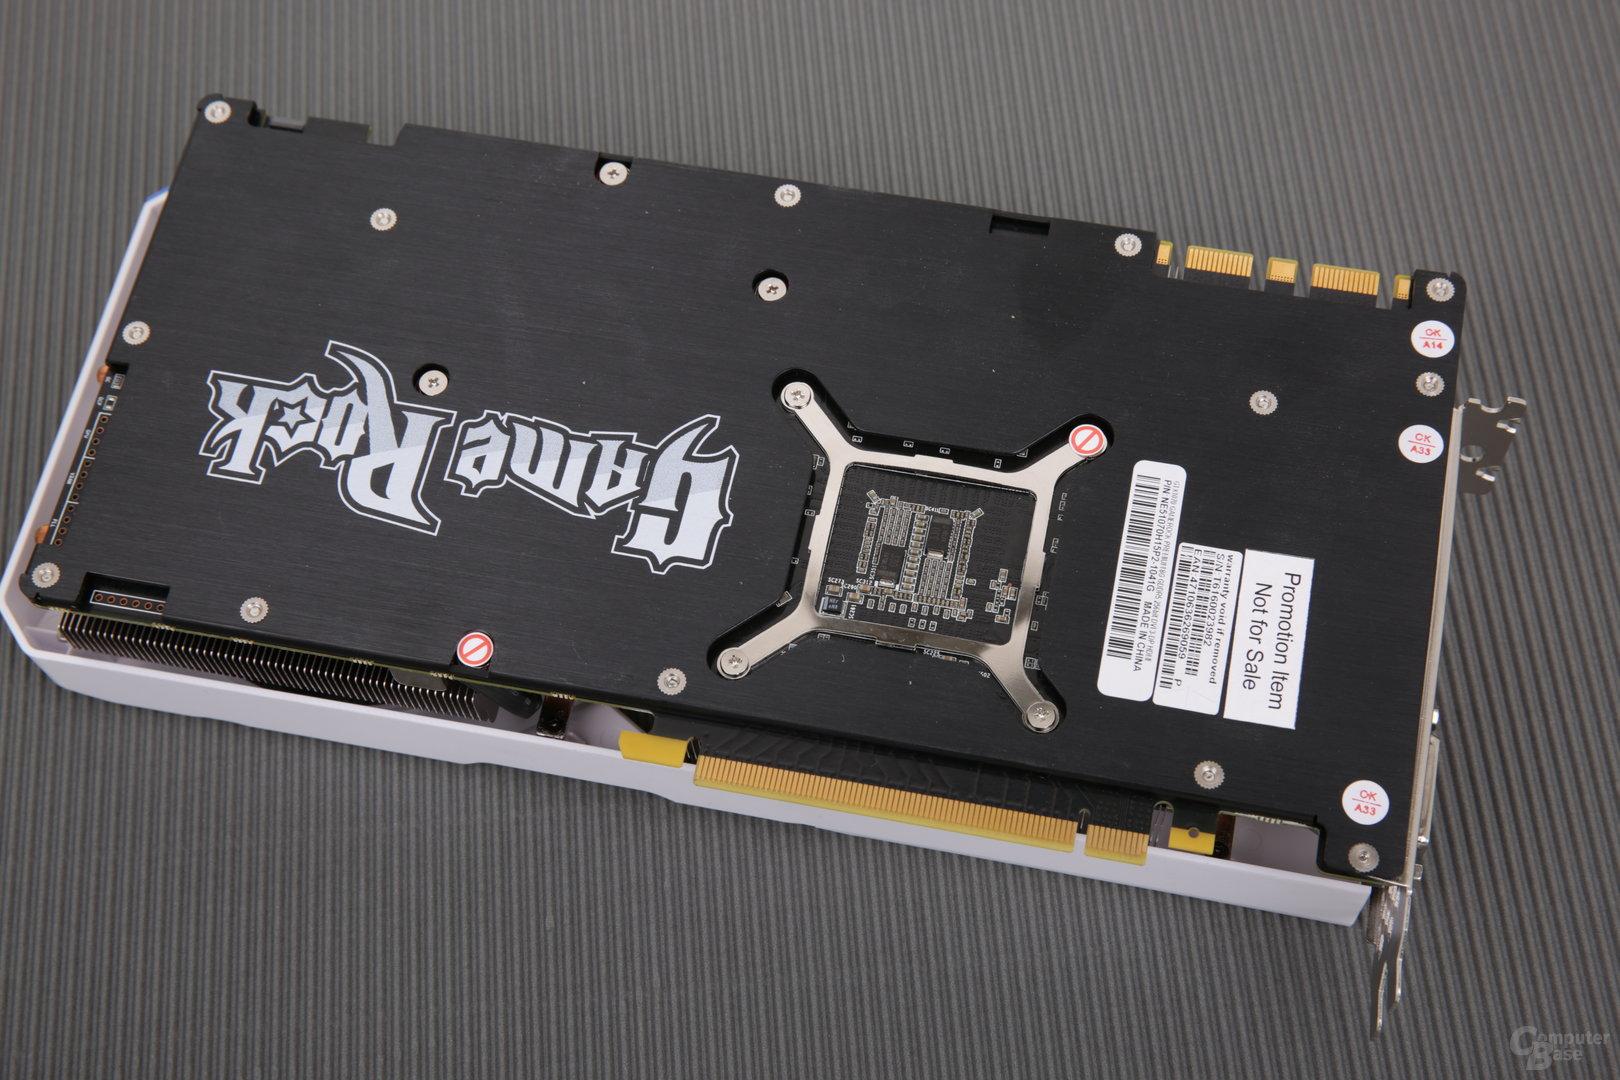 Palit GeForce GTX 1070 GameRock Premium